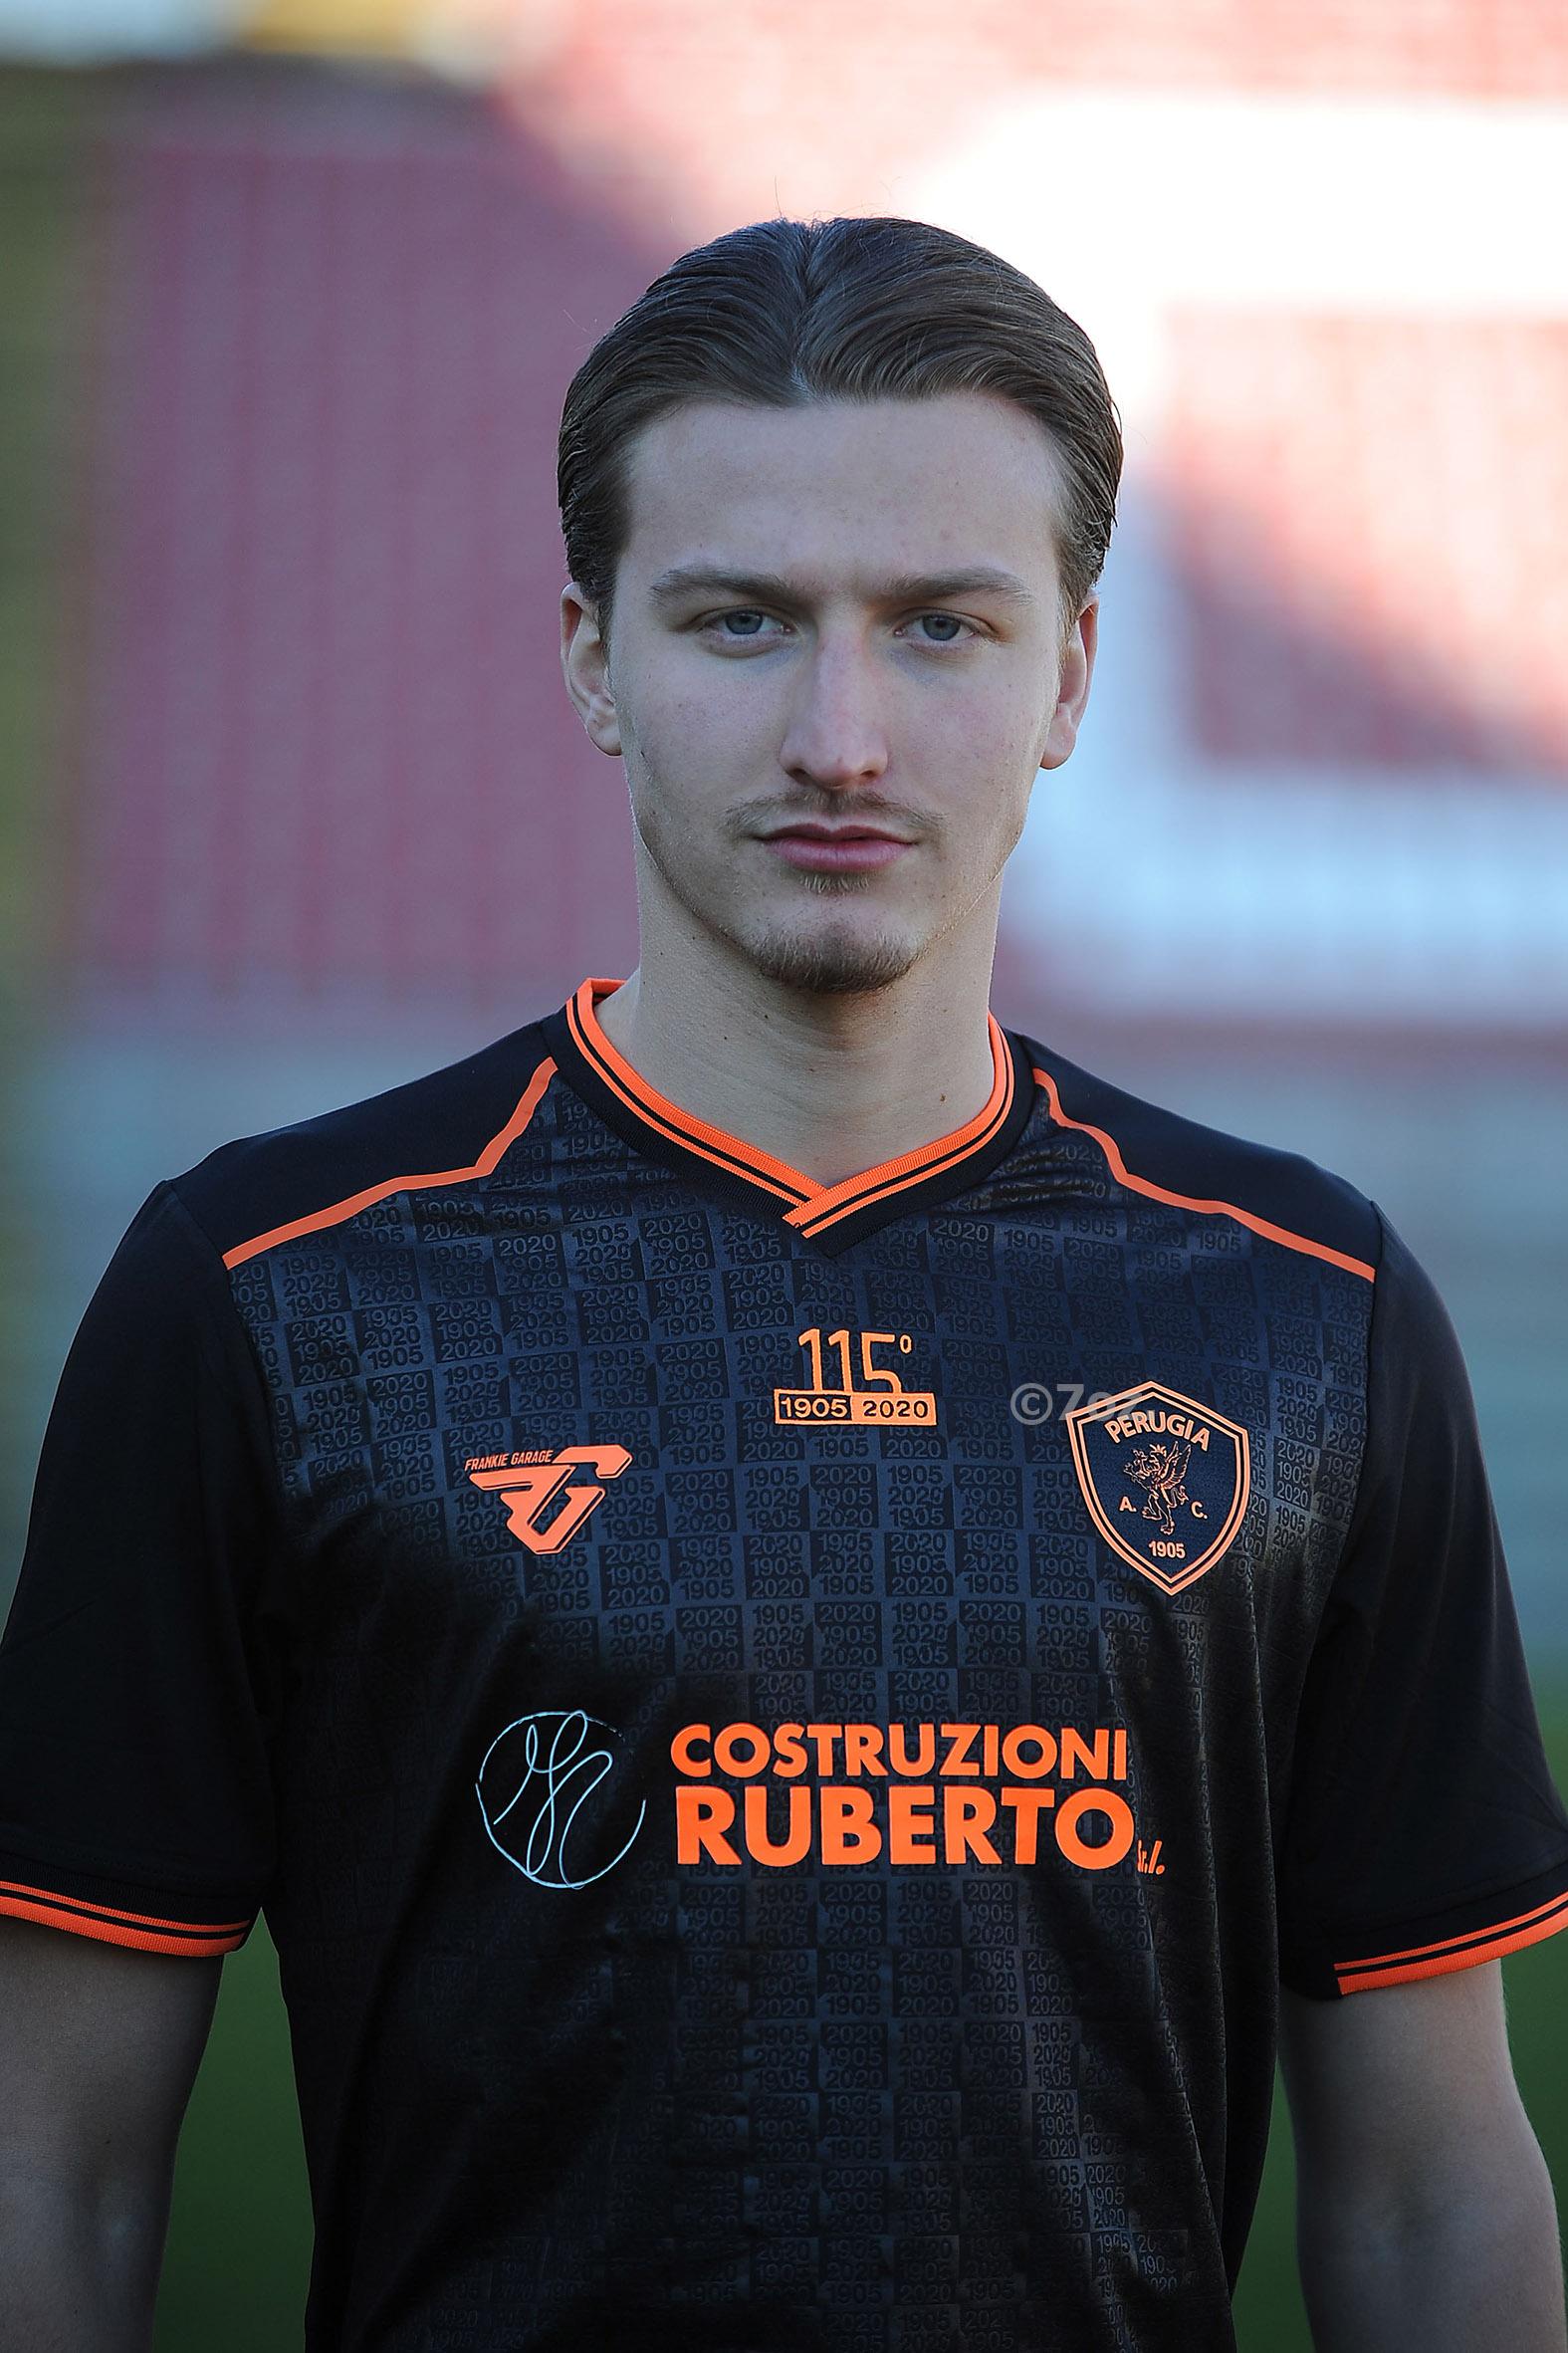 Francesco BaiettiPortiere- A.C. Perugia Calcio